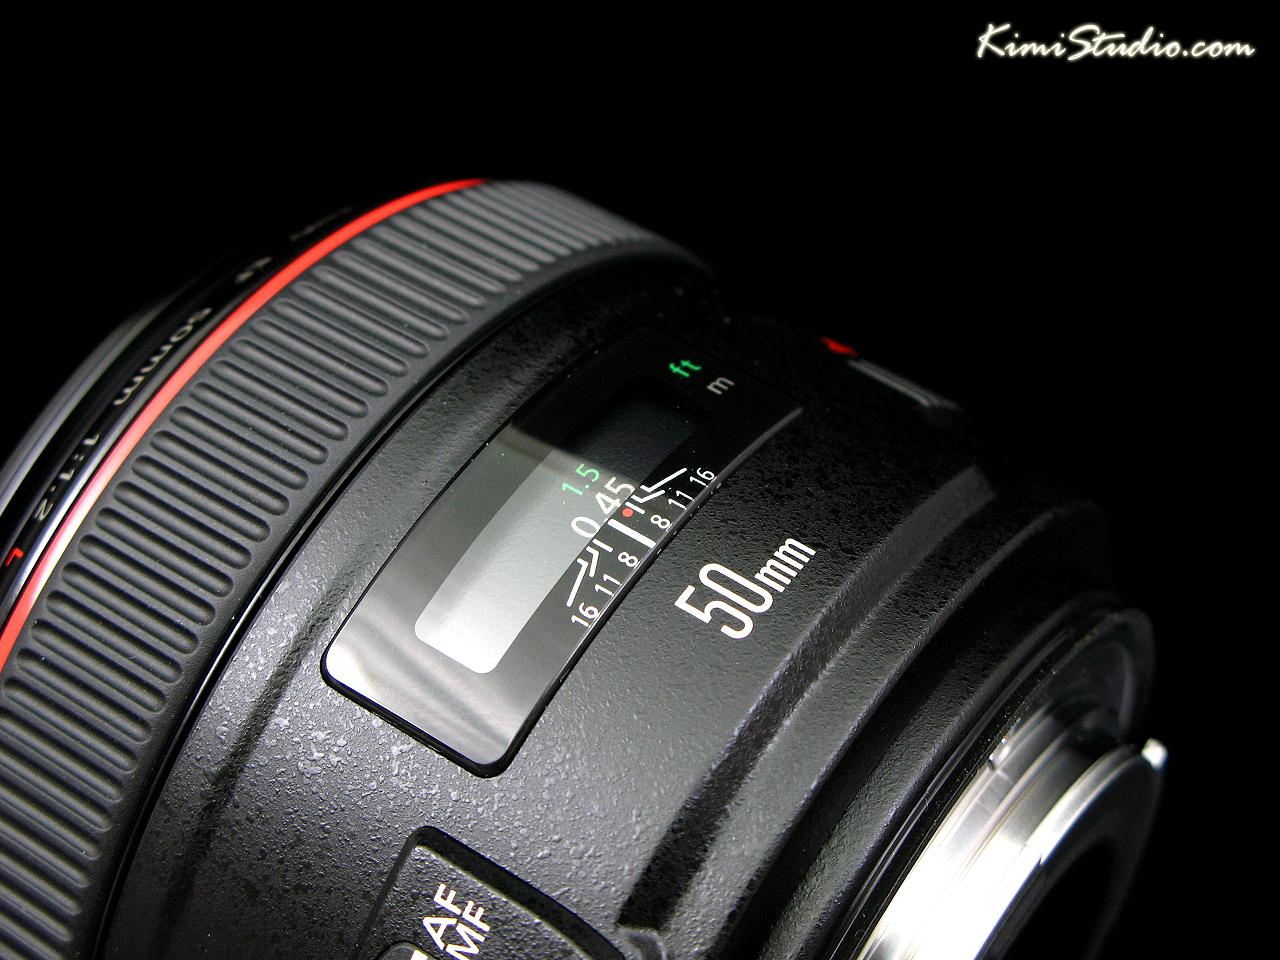 20090604-008